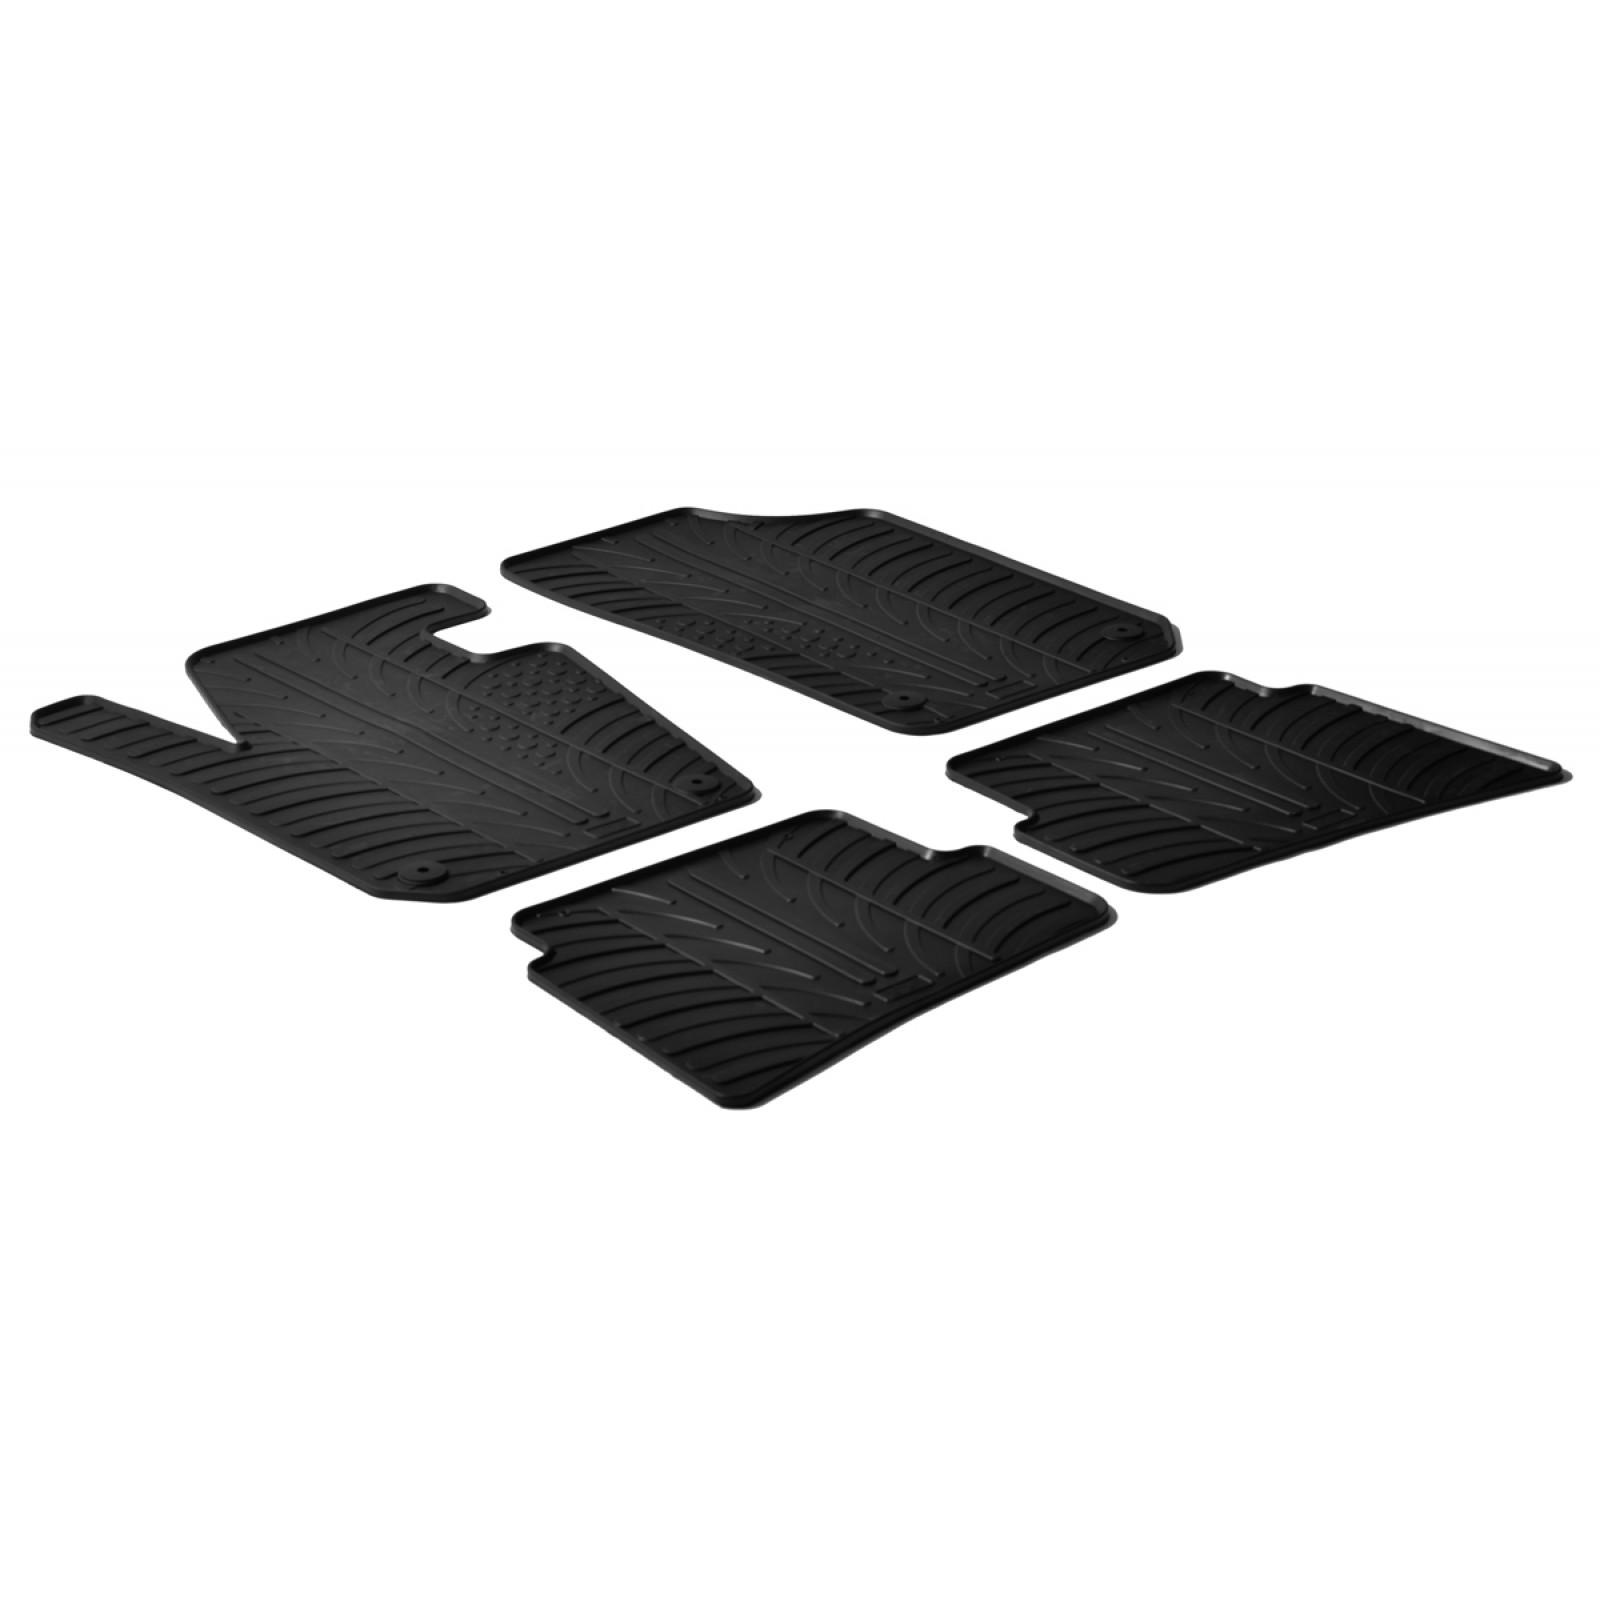 tapis en caoutchouc pour seat ibiza seat tapis en caoutchouc sur mesure offre sur mesure. Black Bedroom Furniture Sets. Home Design Ideas